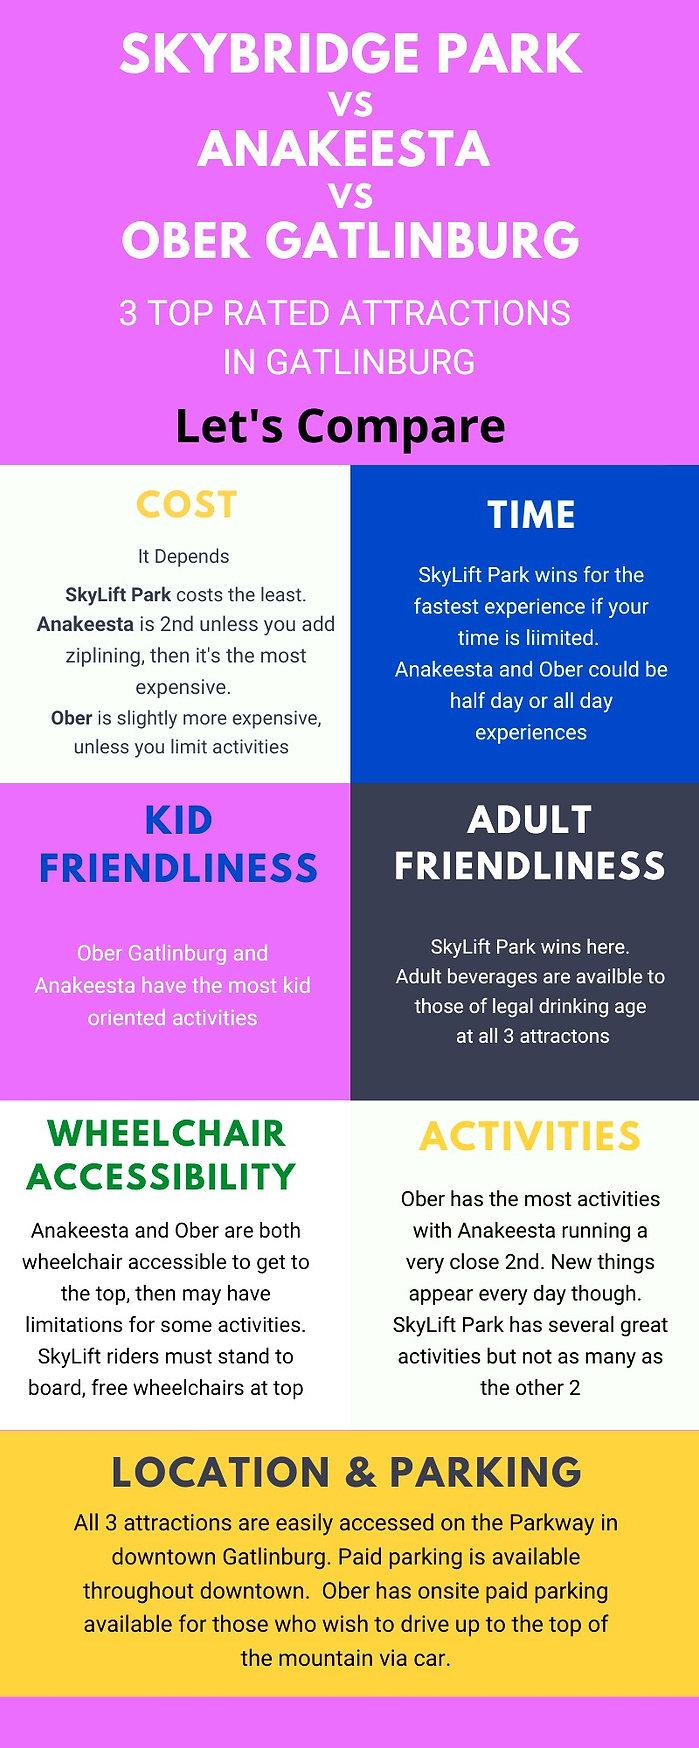 Infographic comparing Anakeesta vs SkyBridge vs Ober Gatlinburg attractions in Gatlinburg TN